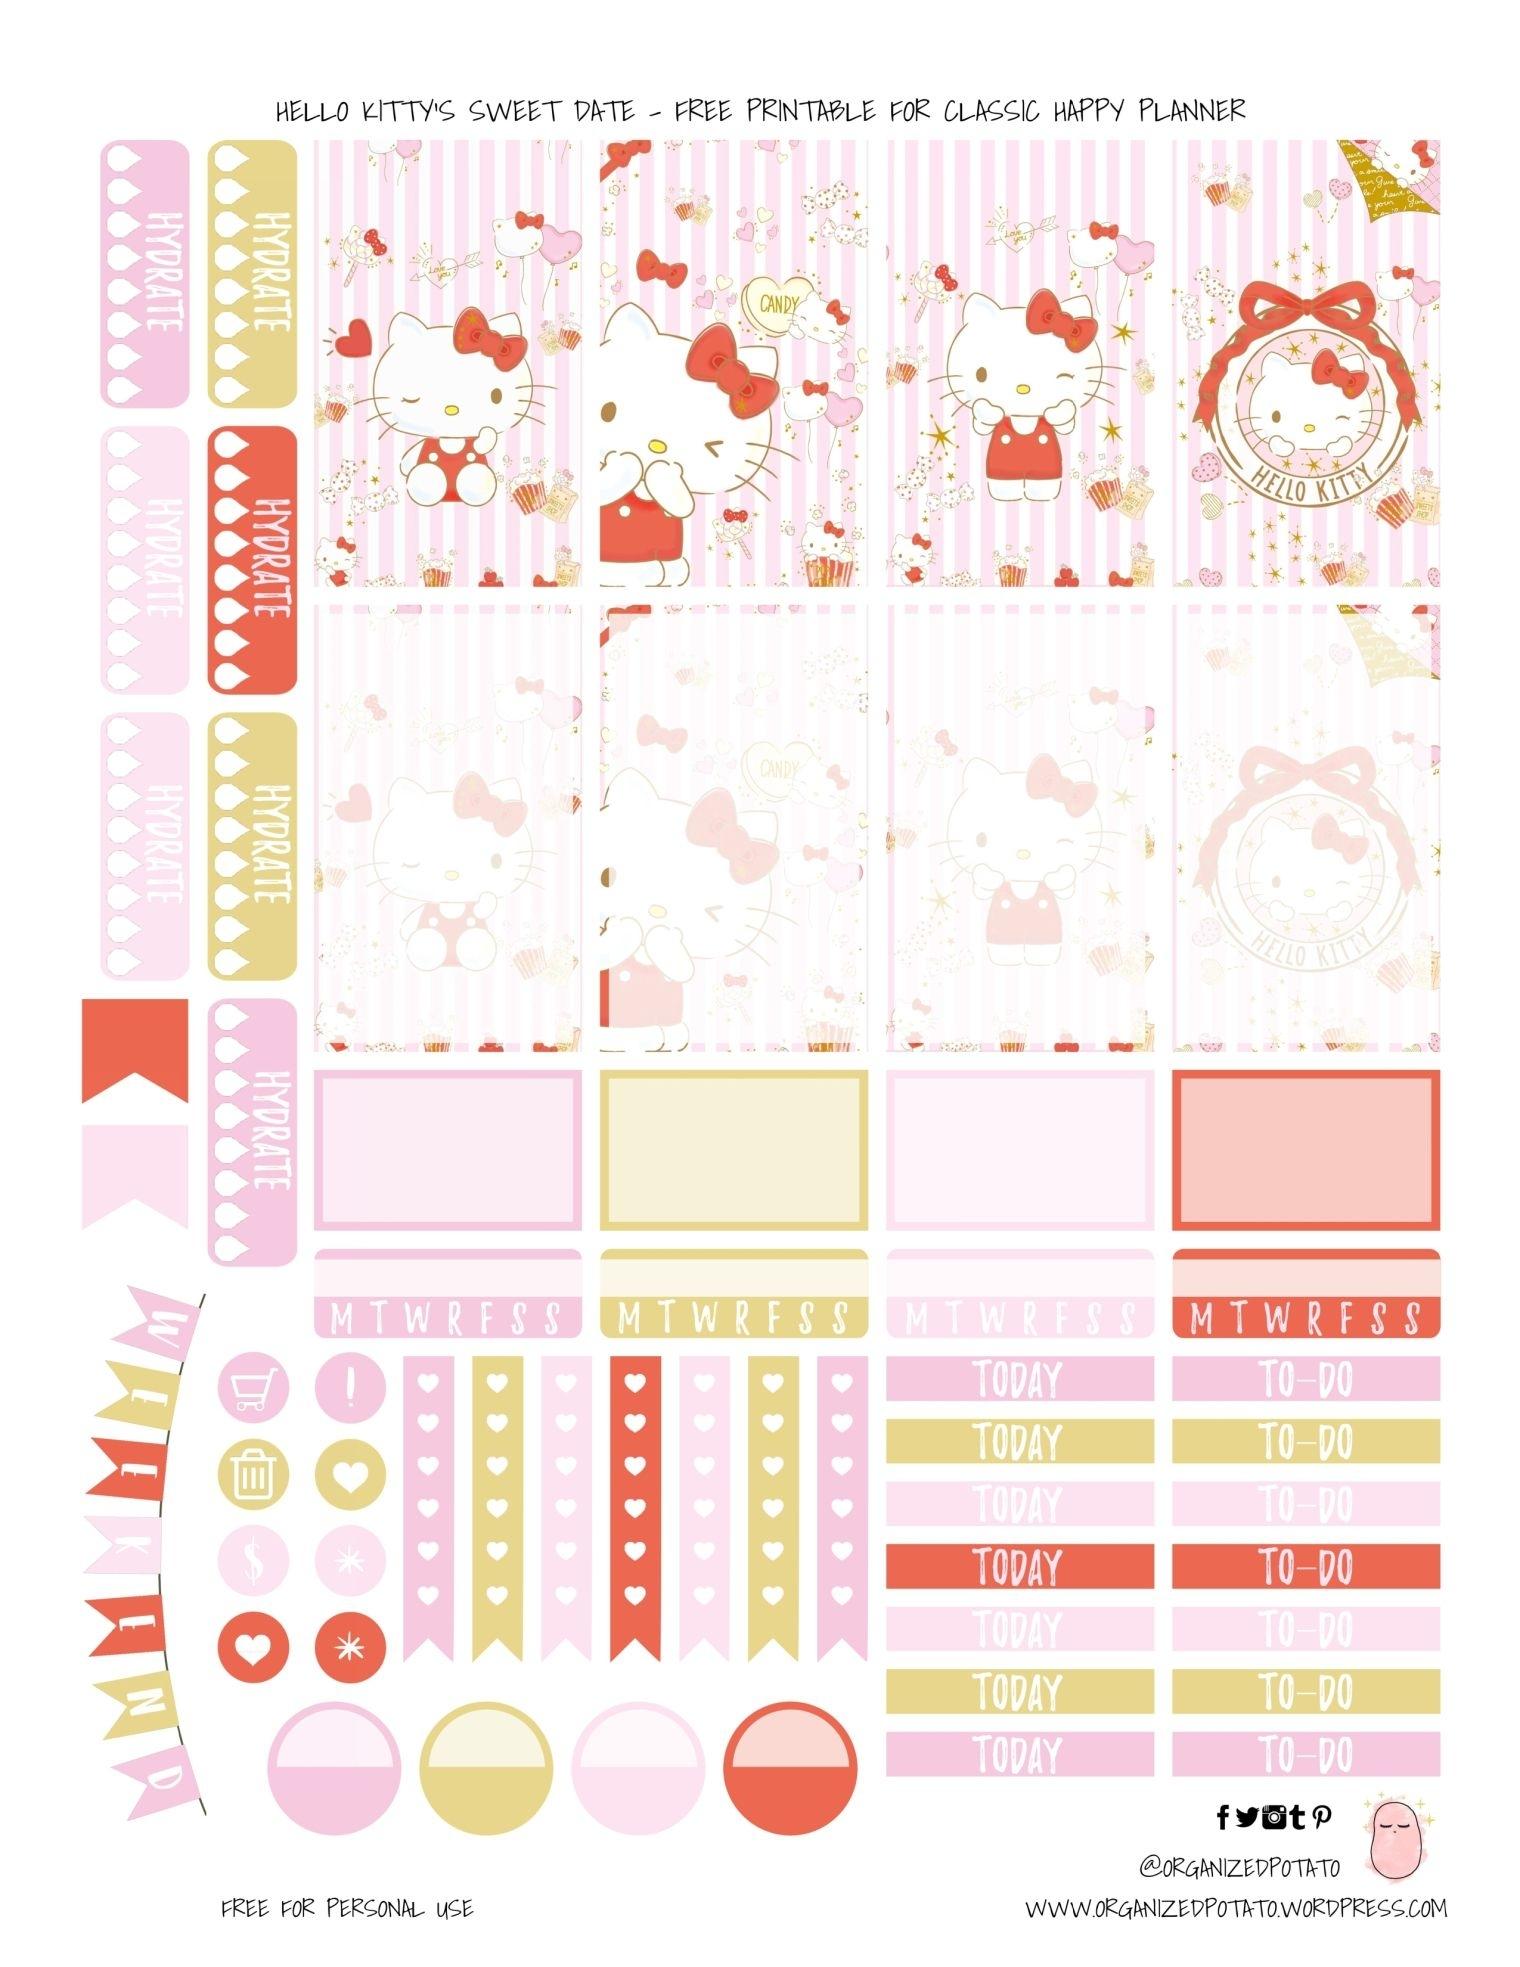 Free Planner Printable: Hello Kitty'S Sweet Date | Printable Planner, Happy Planner, Free Planner